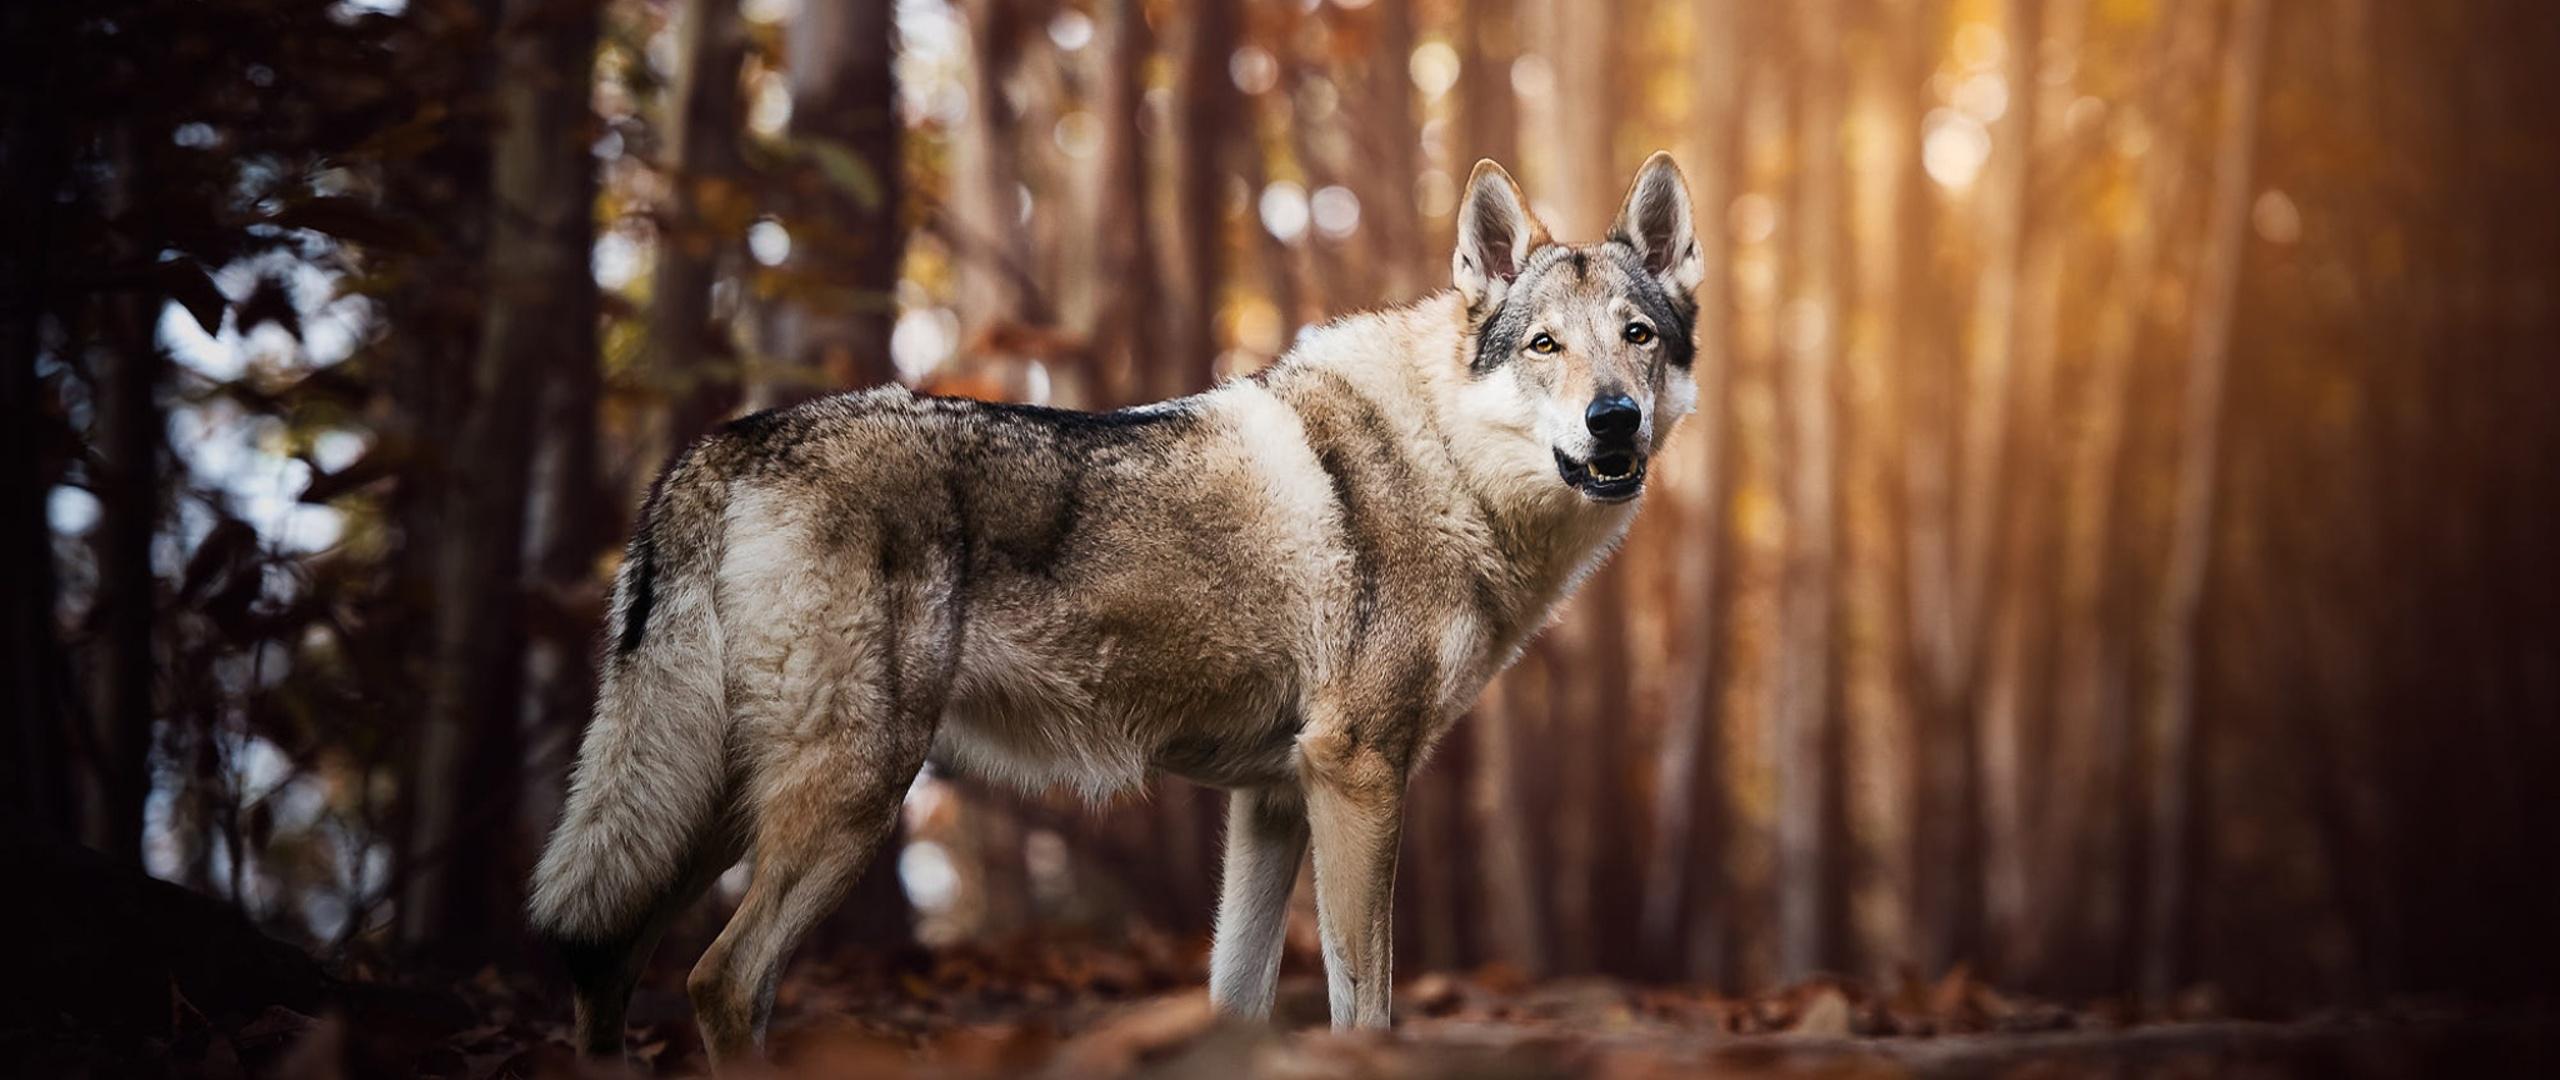 wolf-look-like-dog-60.jpg